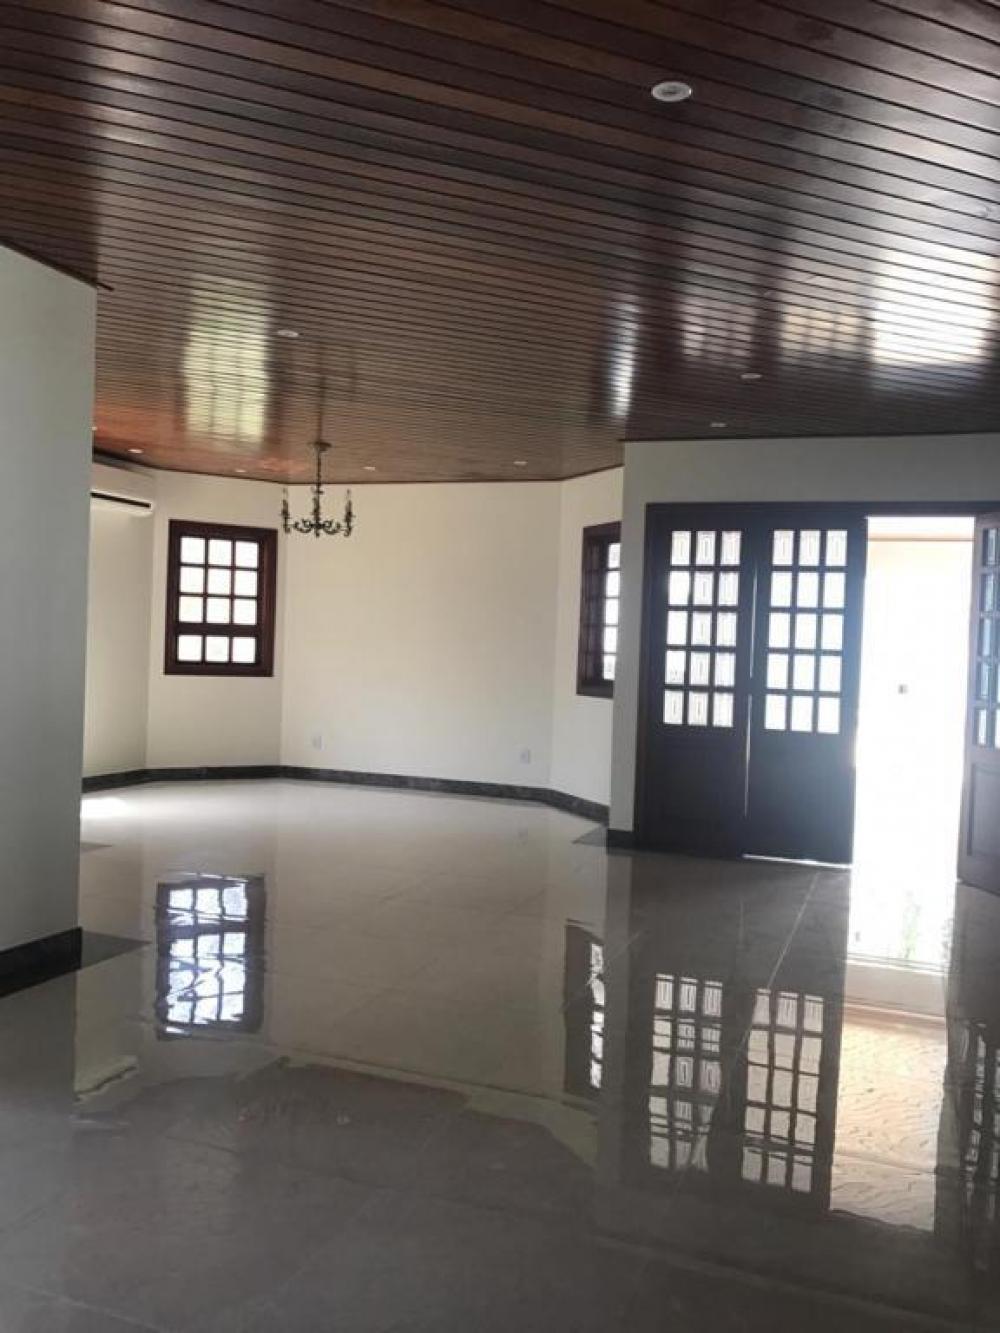 SAO JOSE DO RIO PRETO Casa Locacao R$ 6.500,00 Condominio R$630,00 4 Dormitorios 1 Suite Area do terreno 600.00m2 Area construida 480.00m2